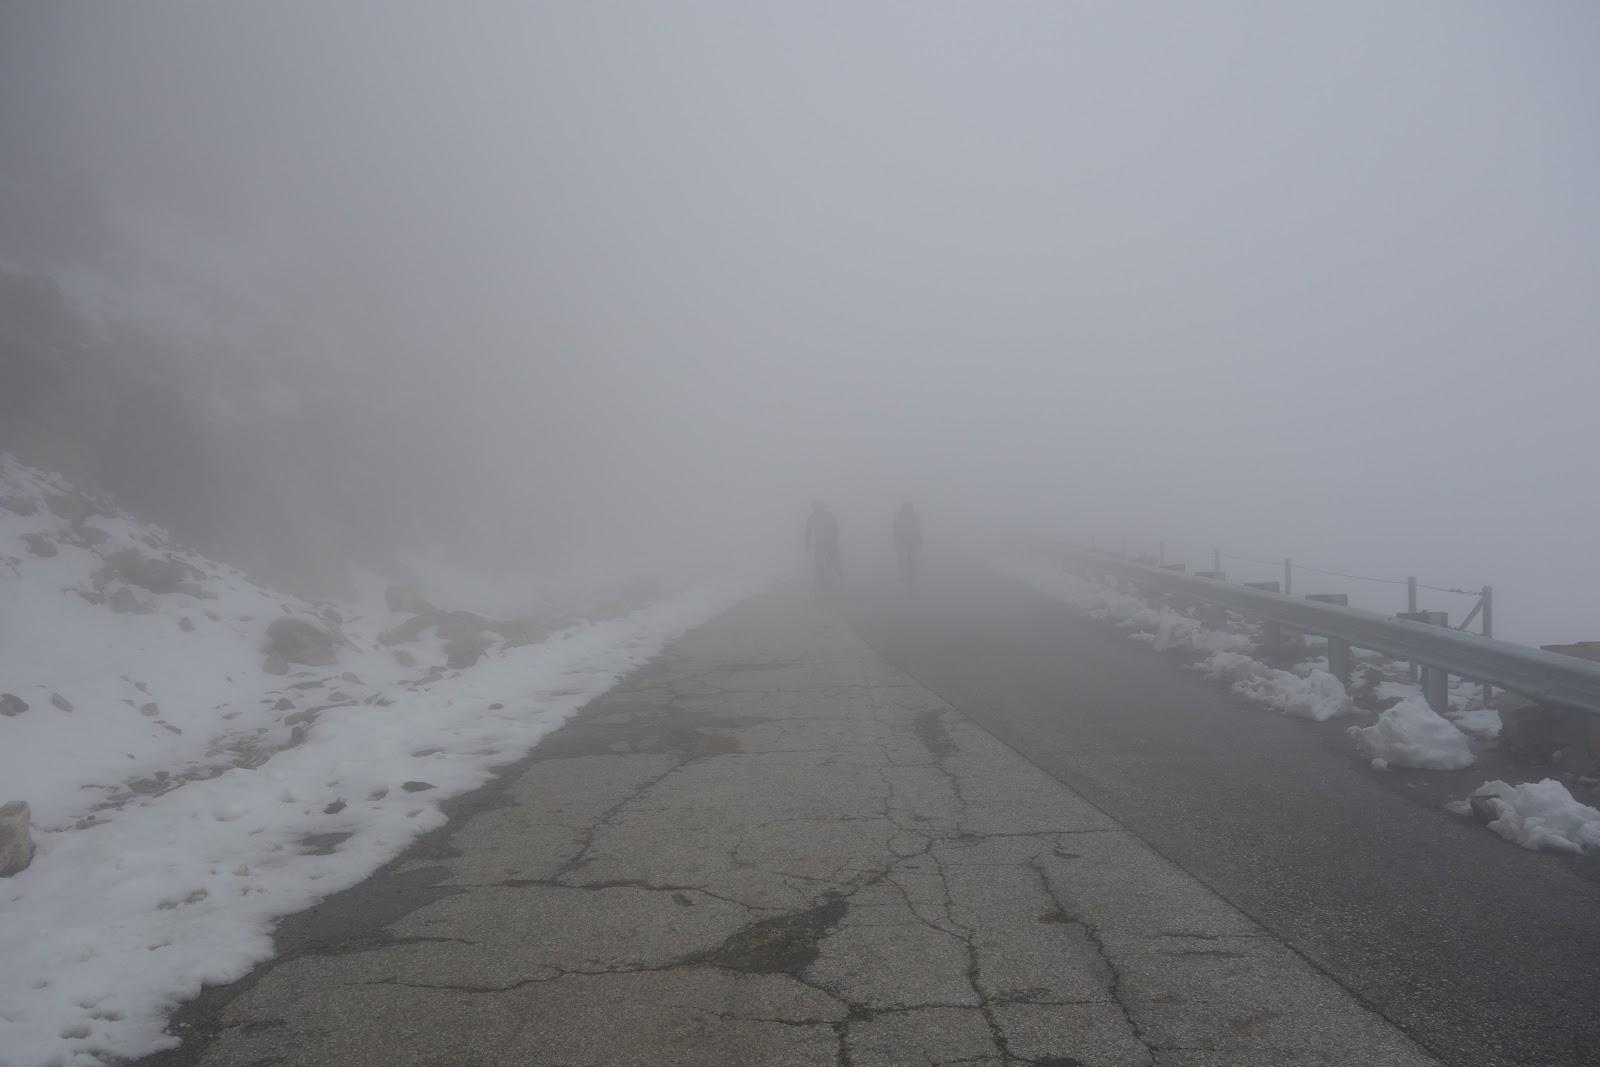 Snow and fog while climbing Dawson Saddle by bike.